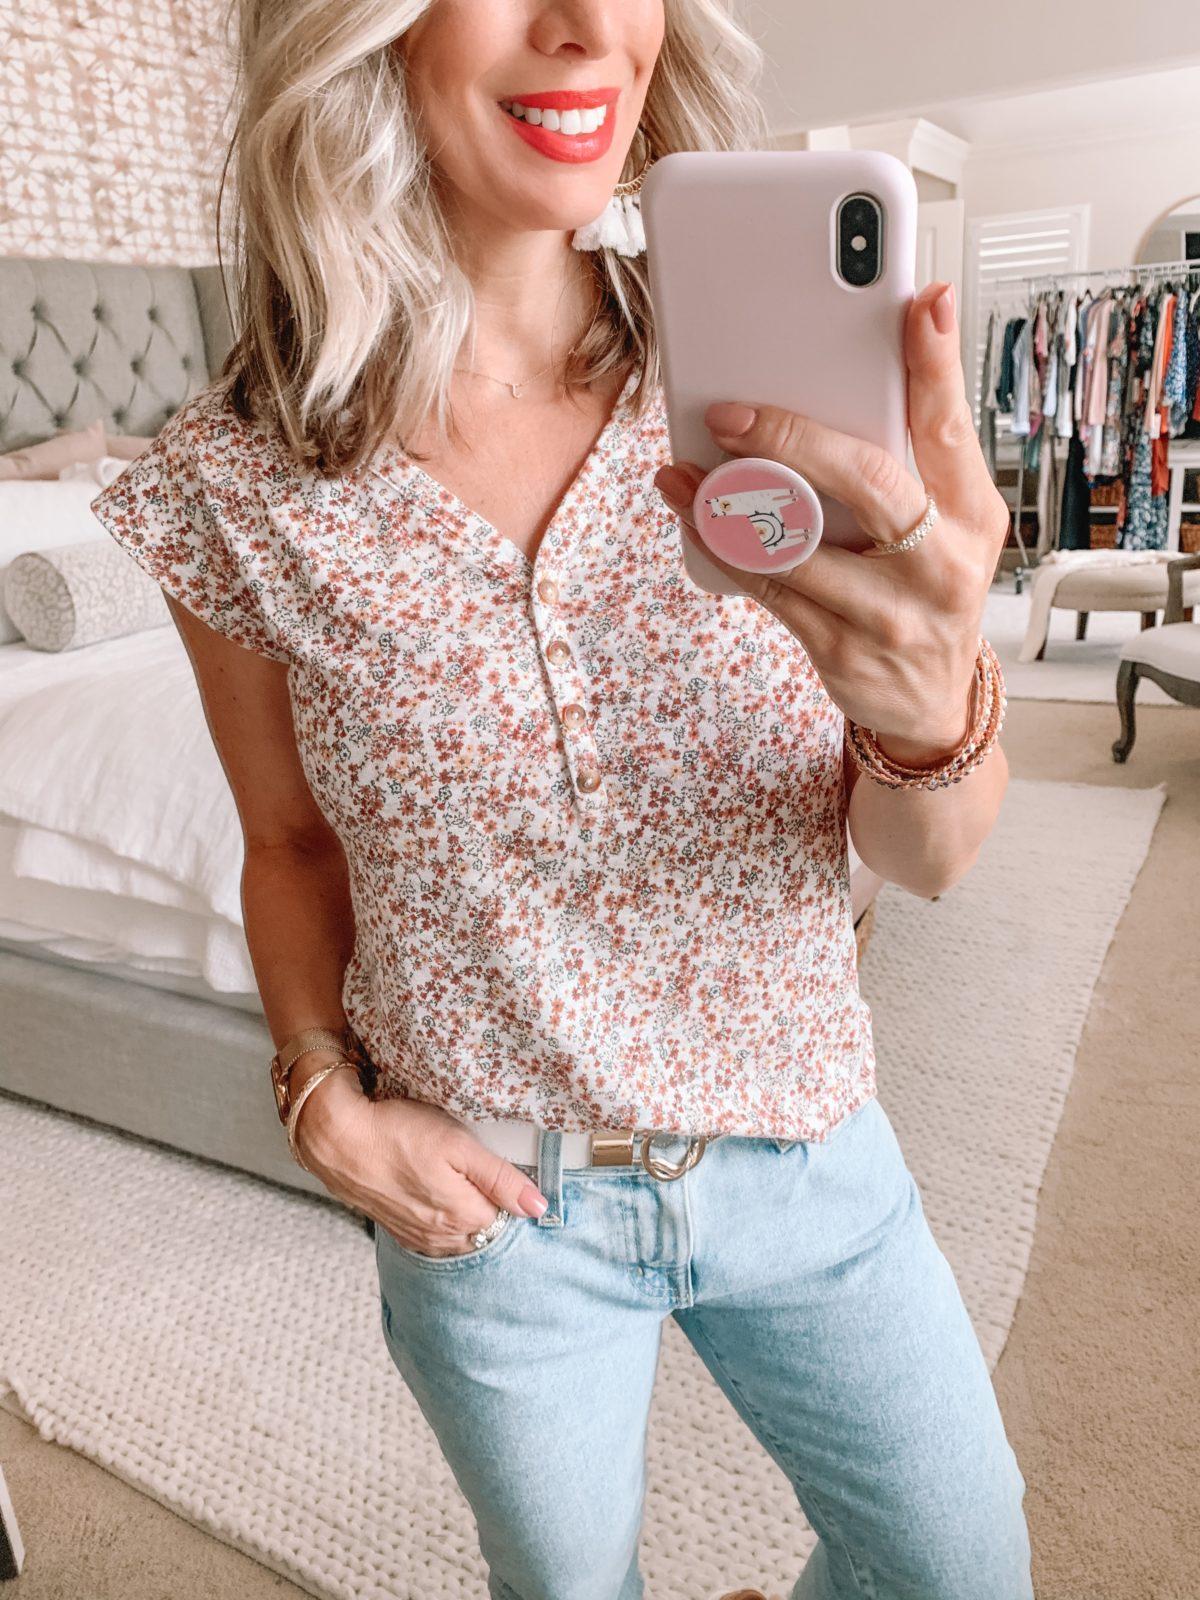 Dressing Room Nordstrom & LOFT, Floral Henley Tee, Ex-Boyfriend Jeans, Stretch Belt